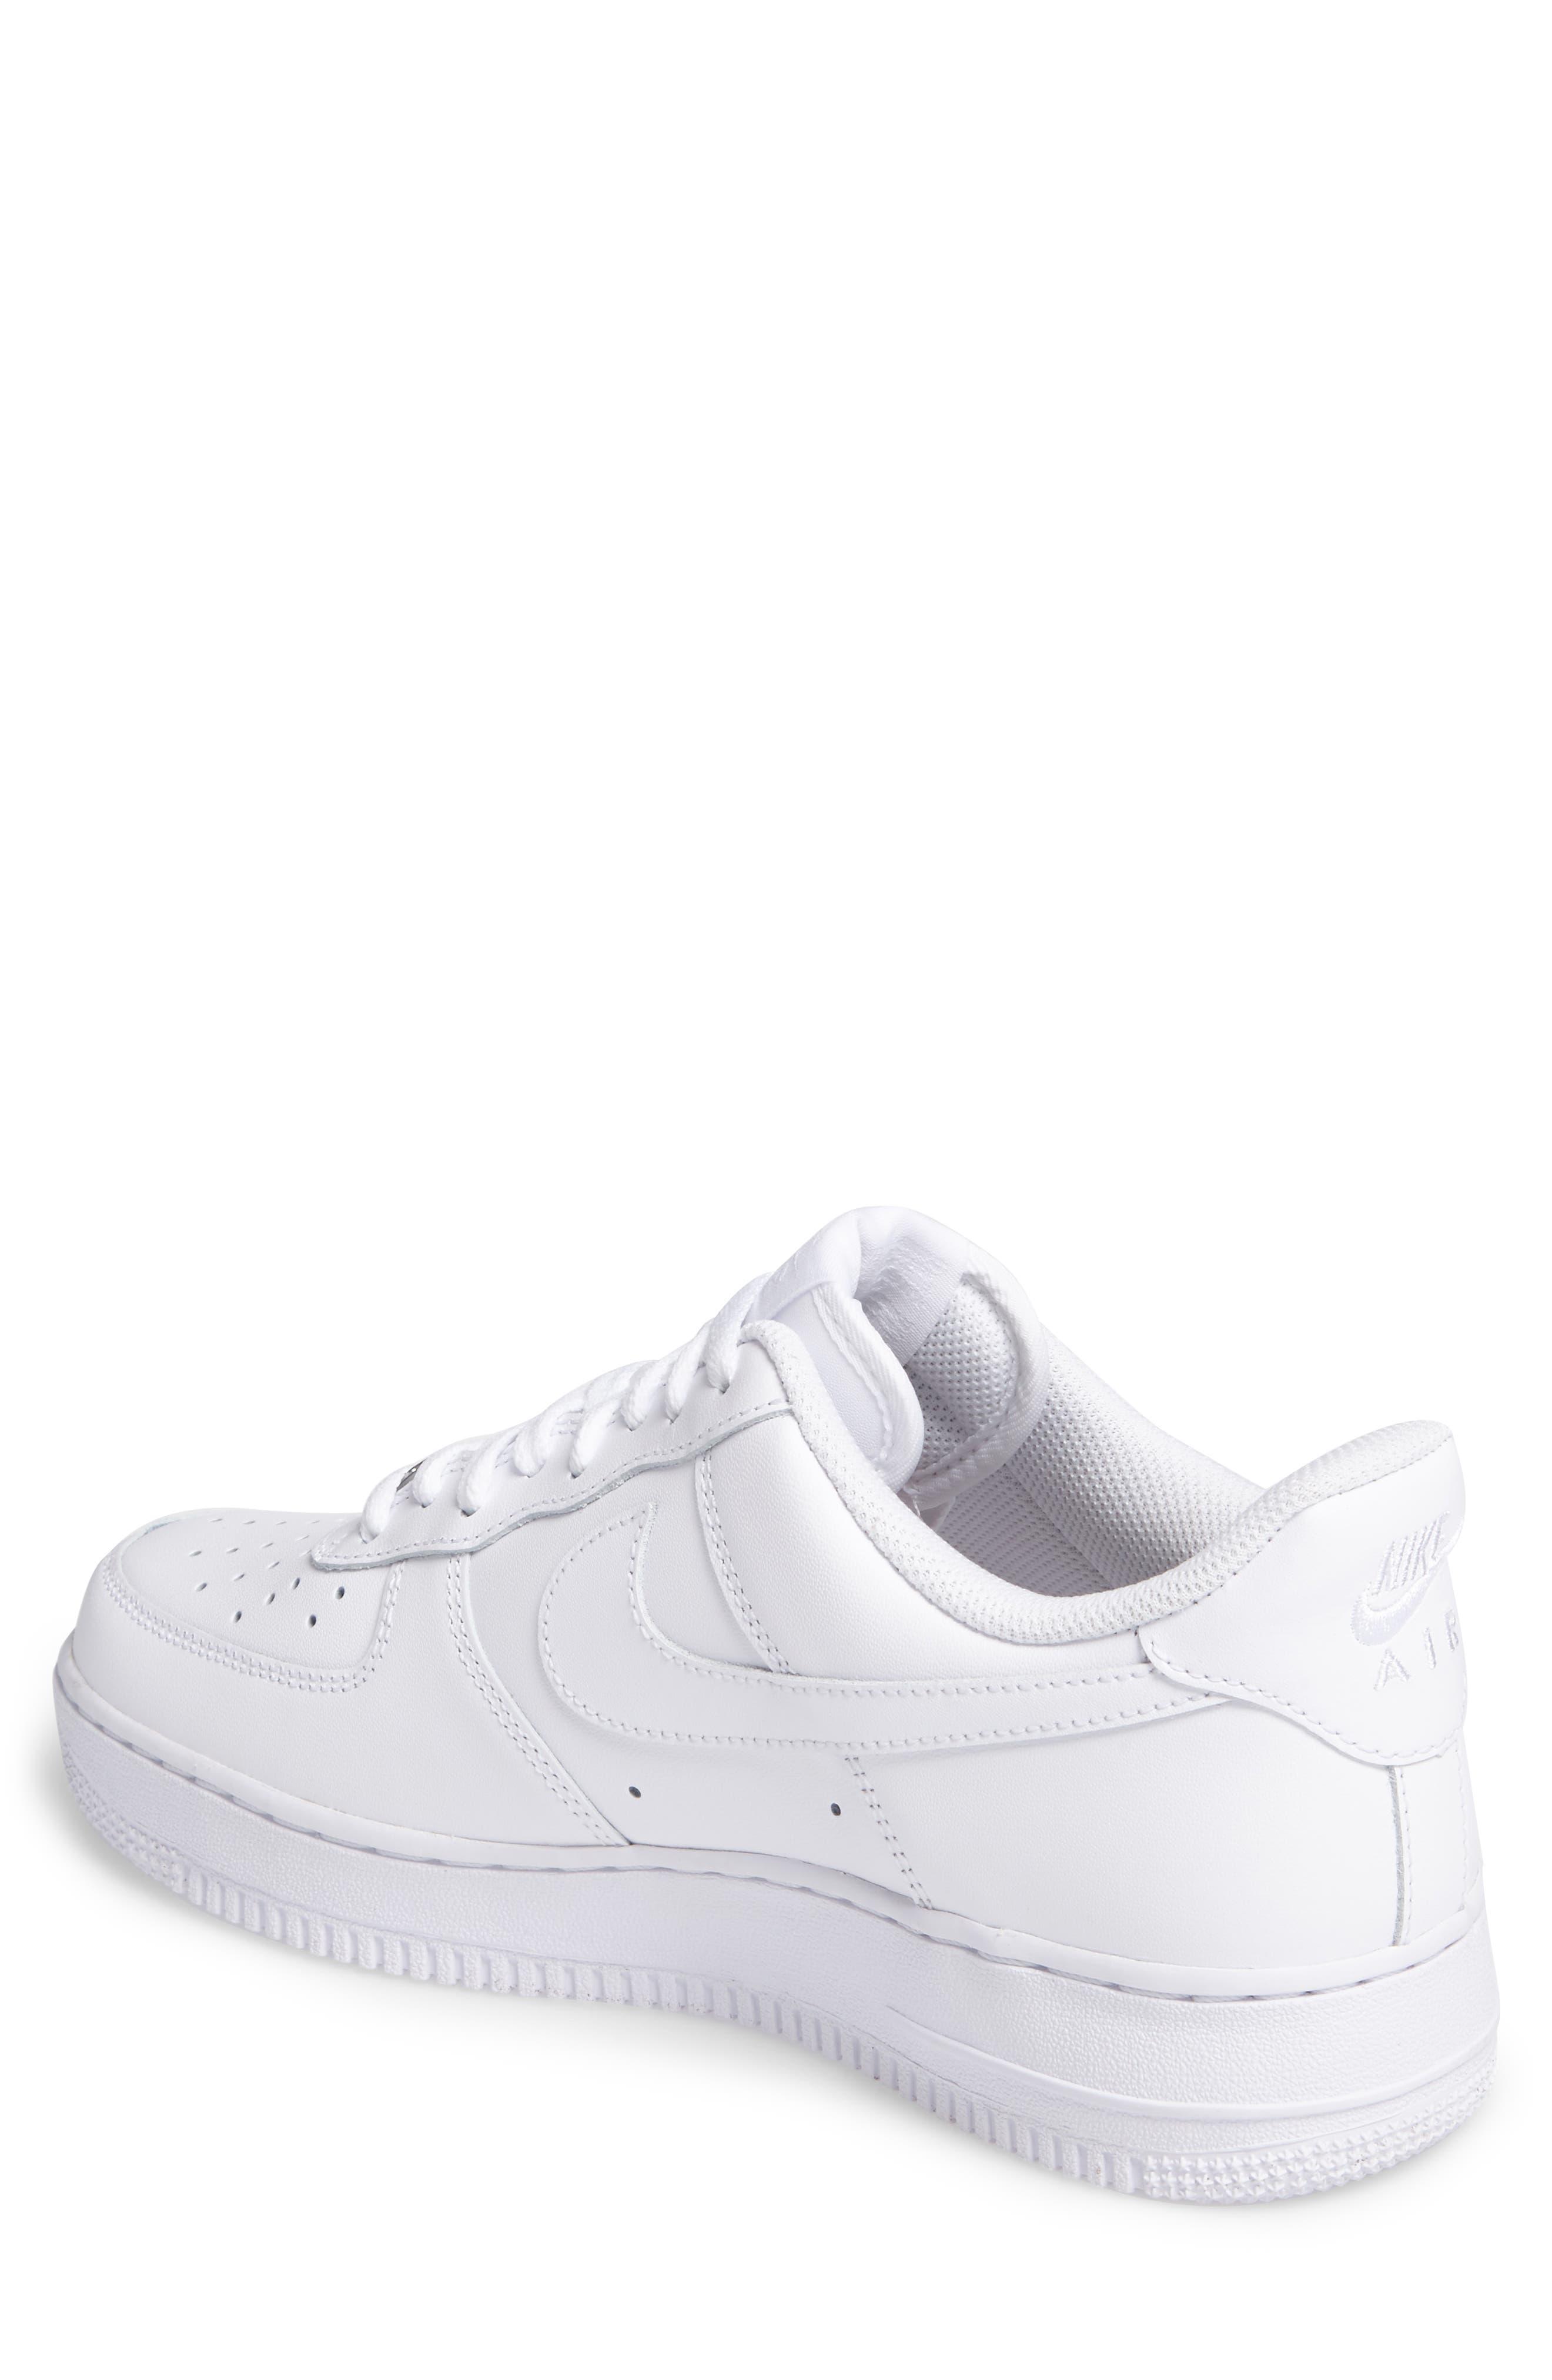 Air Force 1 '07 Sneaker,                             Alternate thumbnail 2, color,                             WHITE/ WHITE